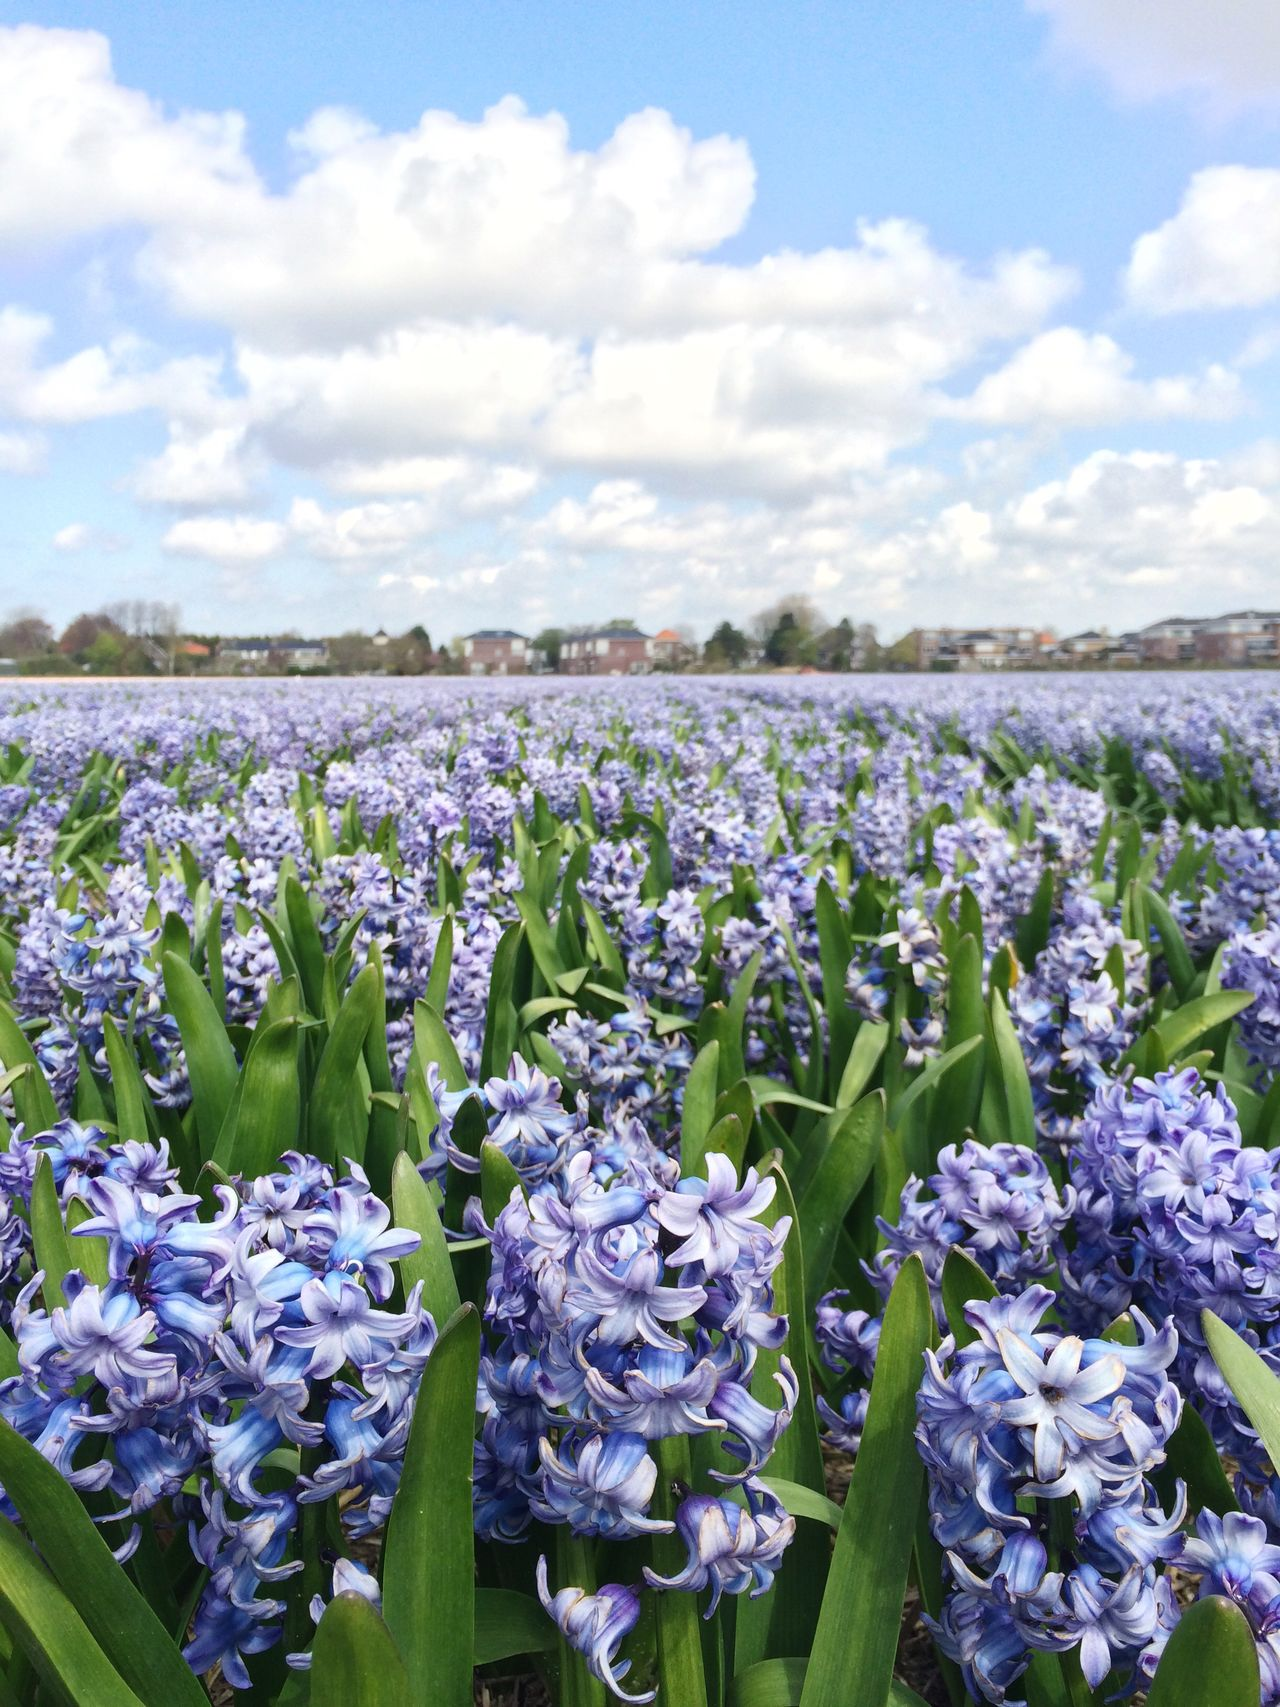 Dutch Landscape Flower Fields Holland Hiacynth Blue Flowers Mass Beautiful Nature Netherlands Bulbous Flowers